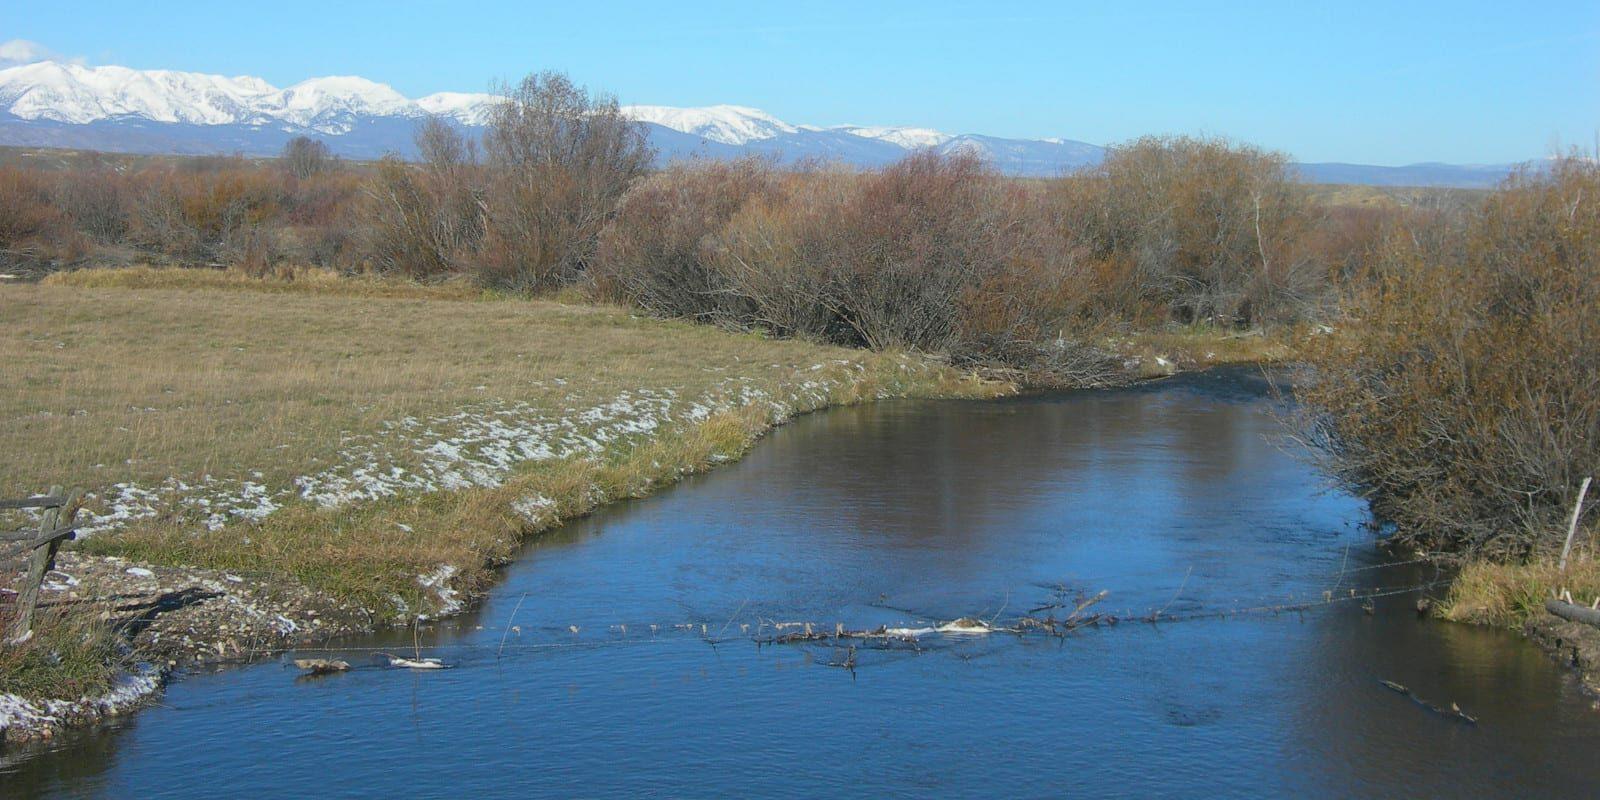 Image of the Michigan River in Colorado